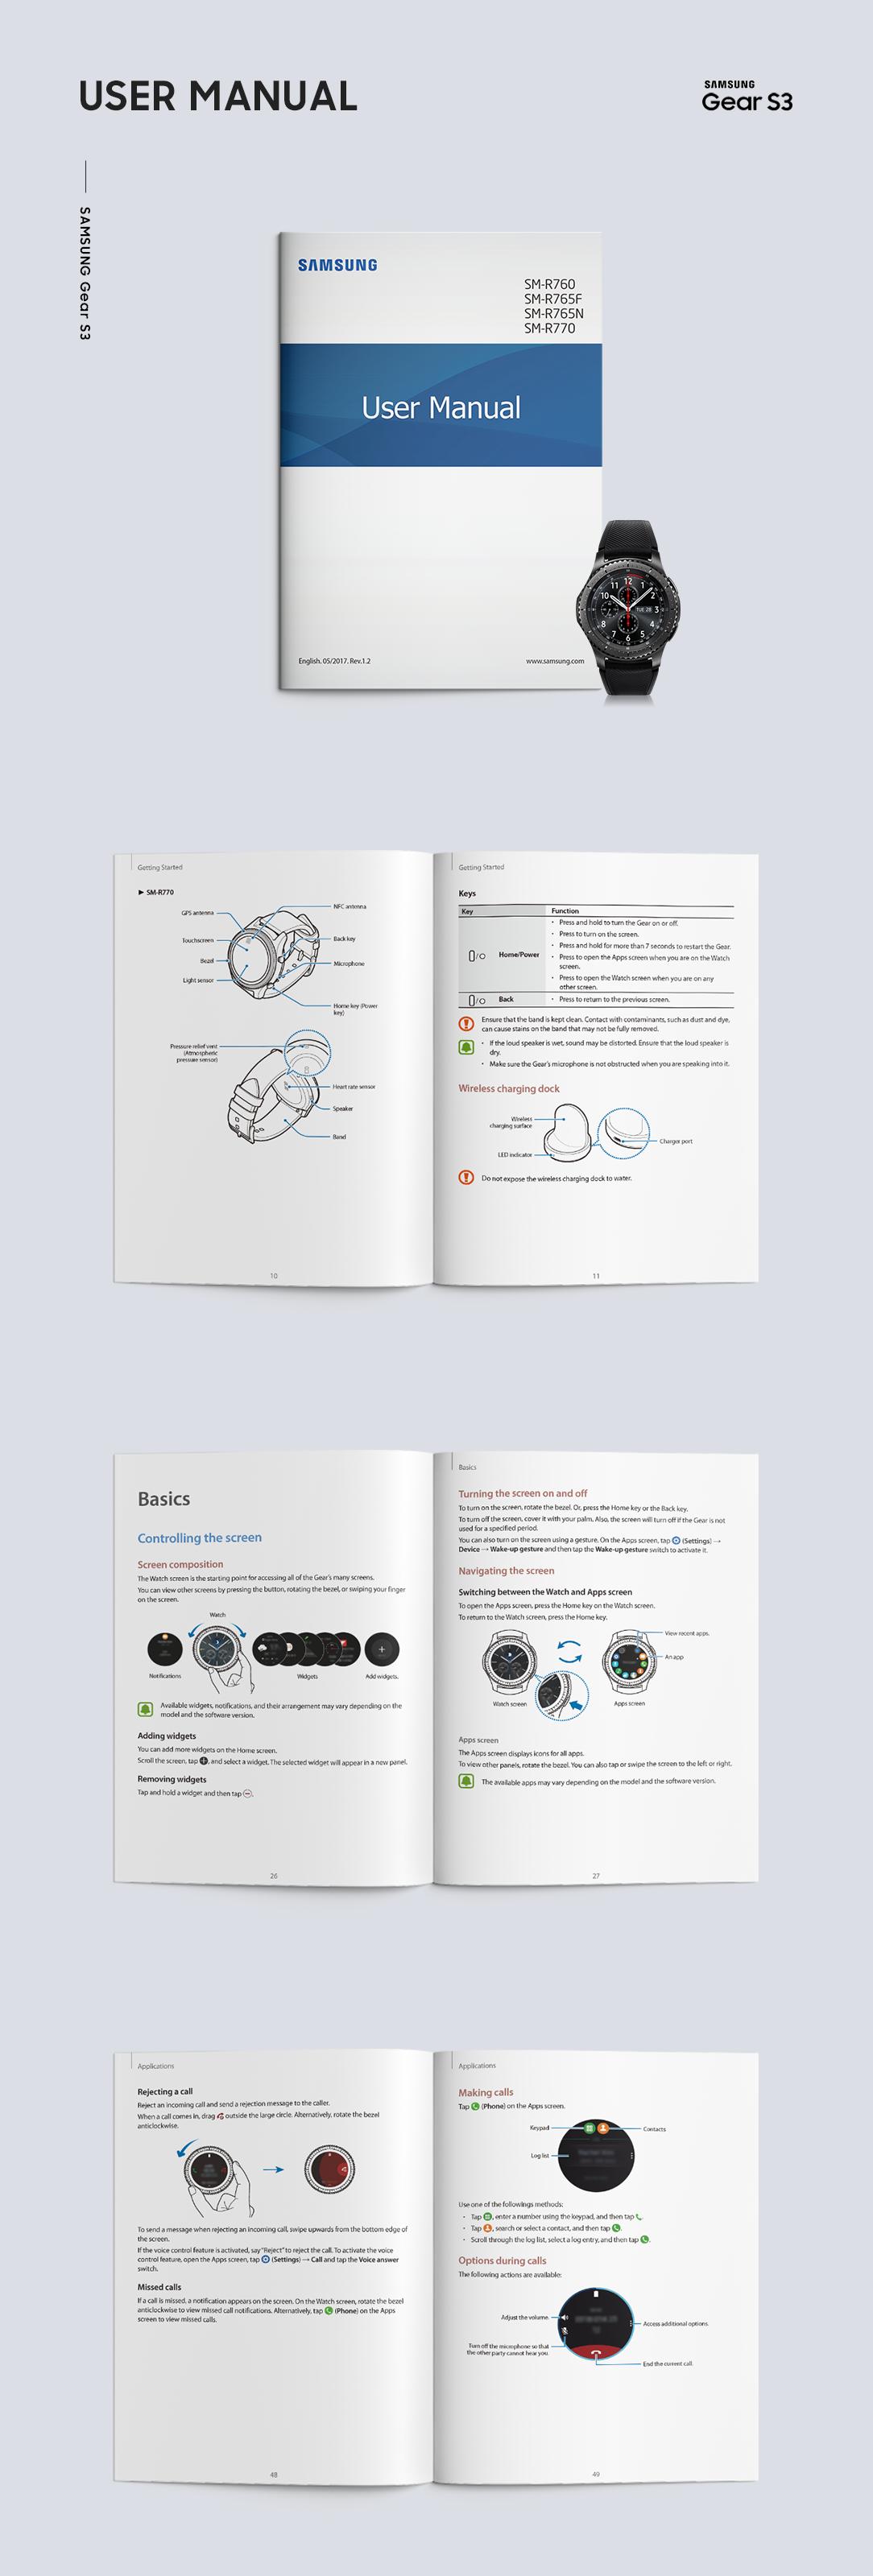 Gear S3 portfolio image